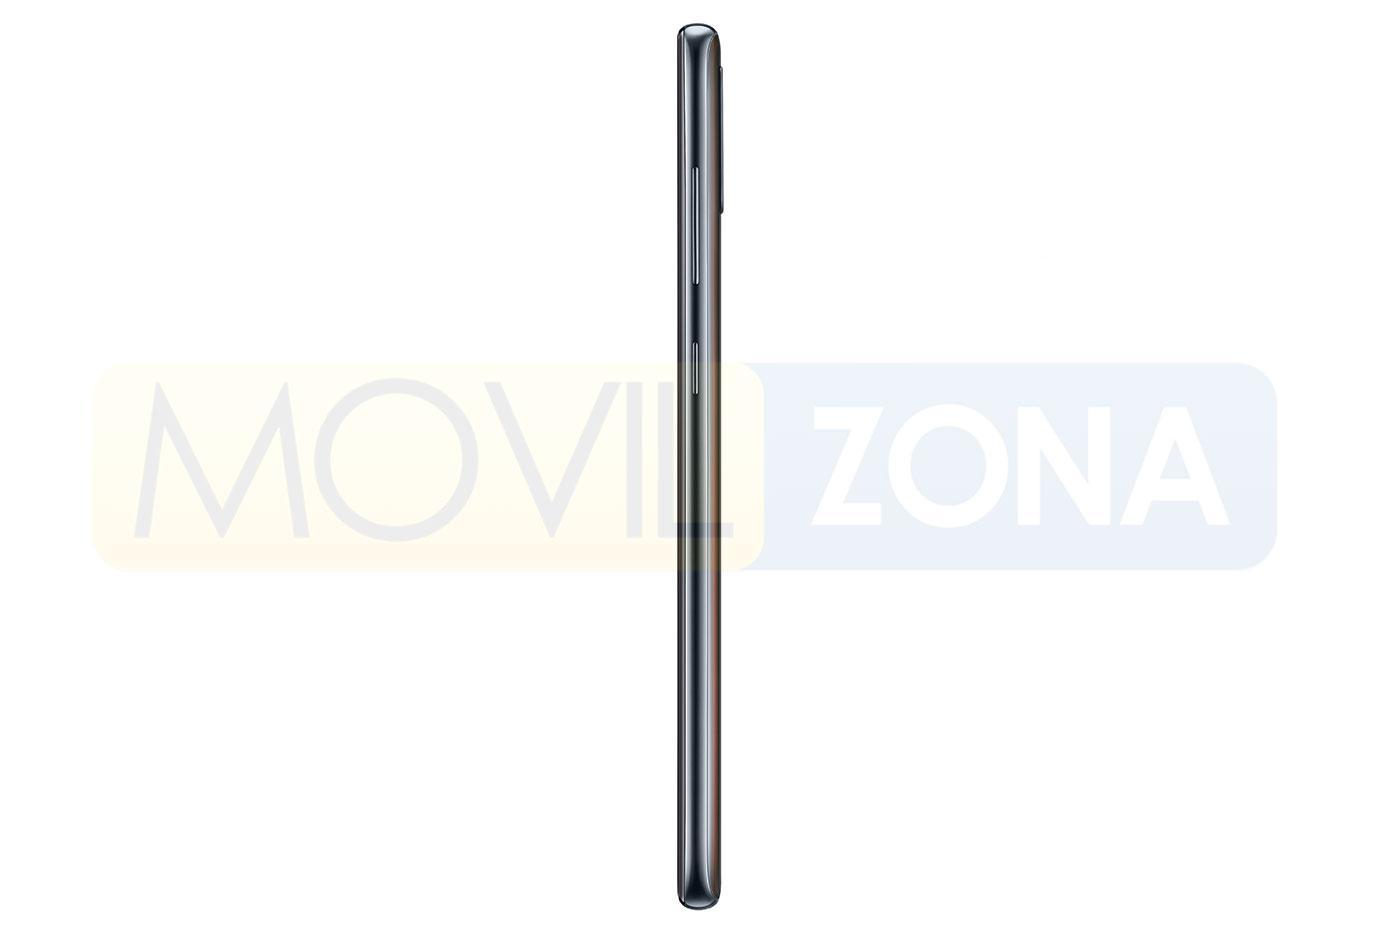 Samsung Galaxy A70 lateral